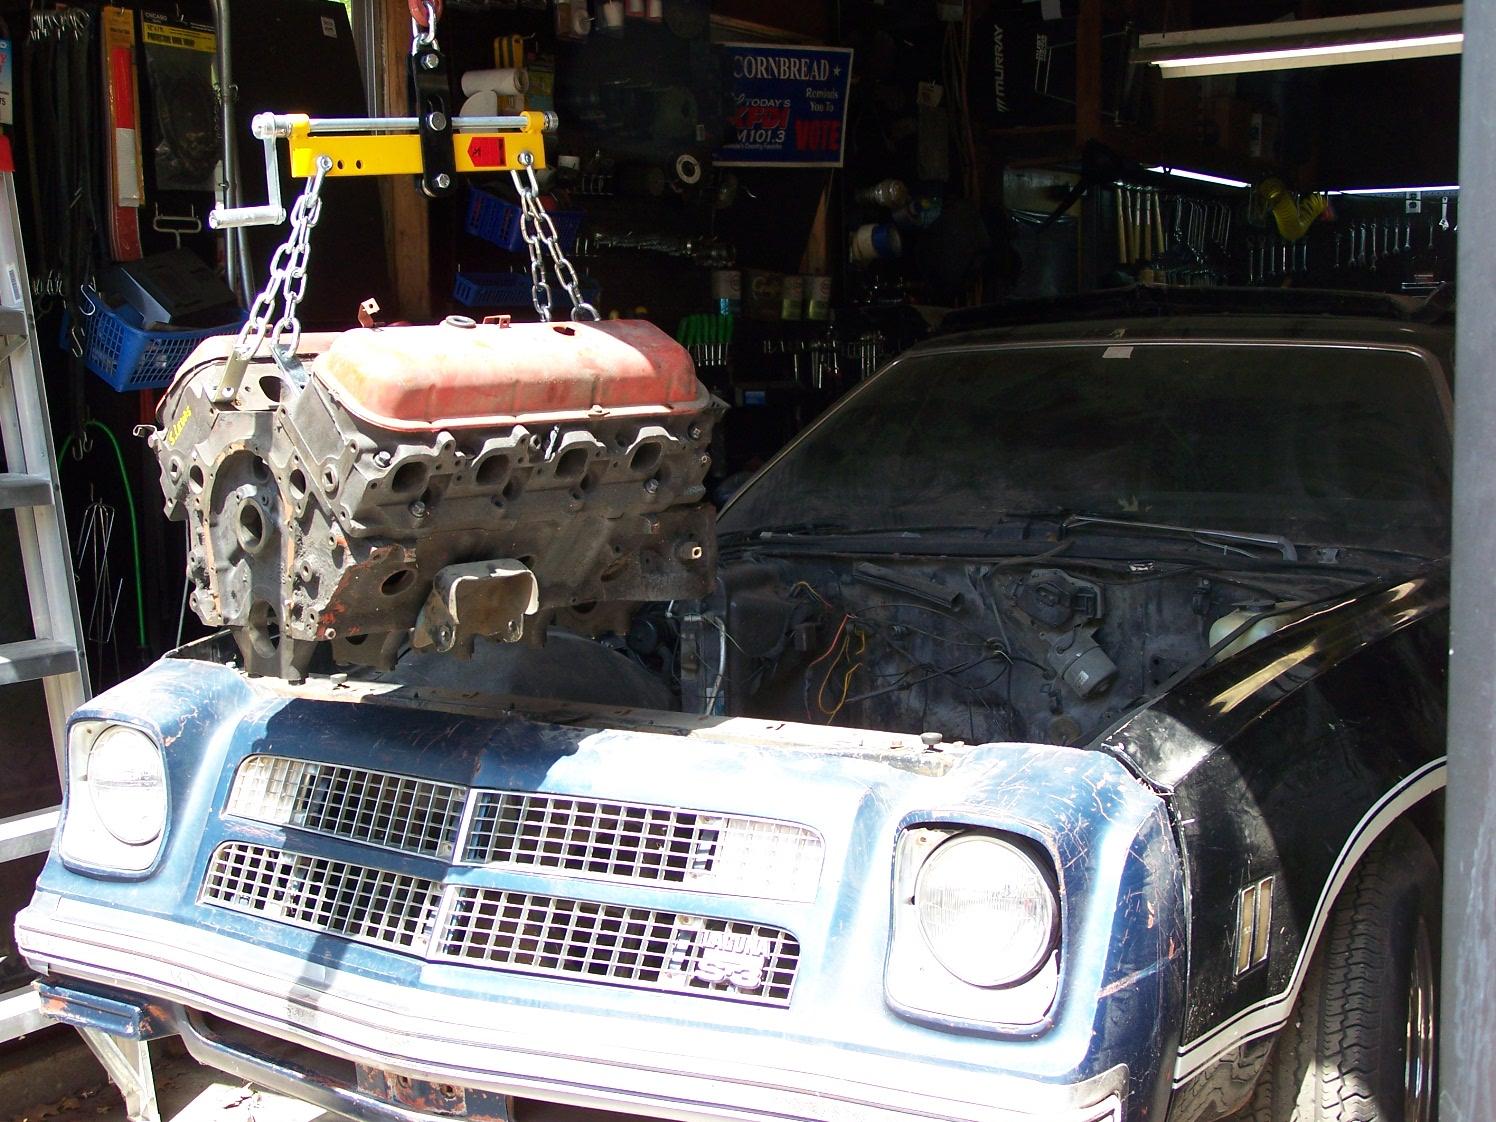 All Chevy 1976 chevy laguna : 1976 Chevrolet Laguna S3 aka Midnight Seductress